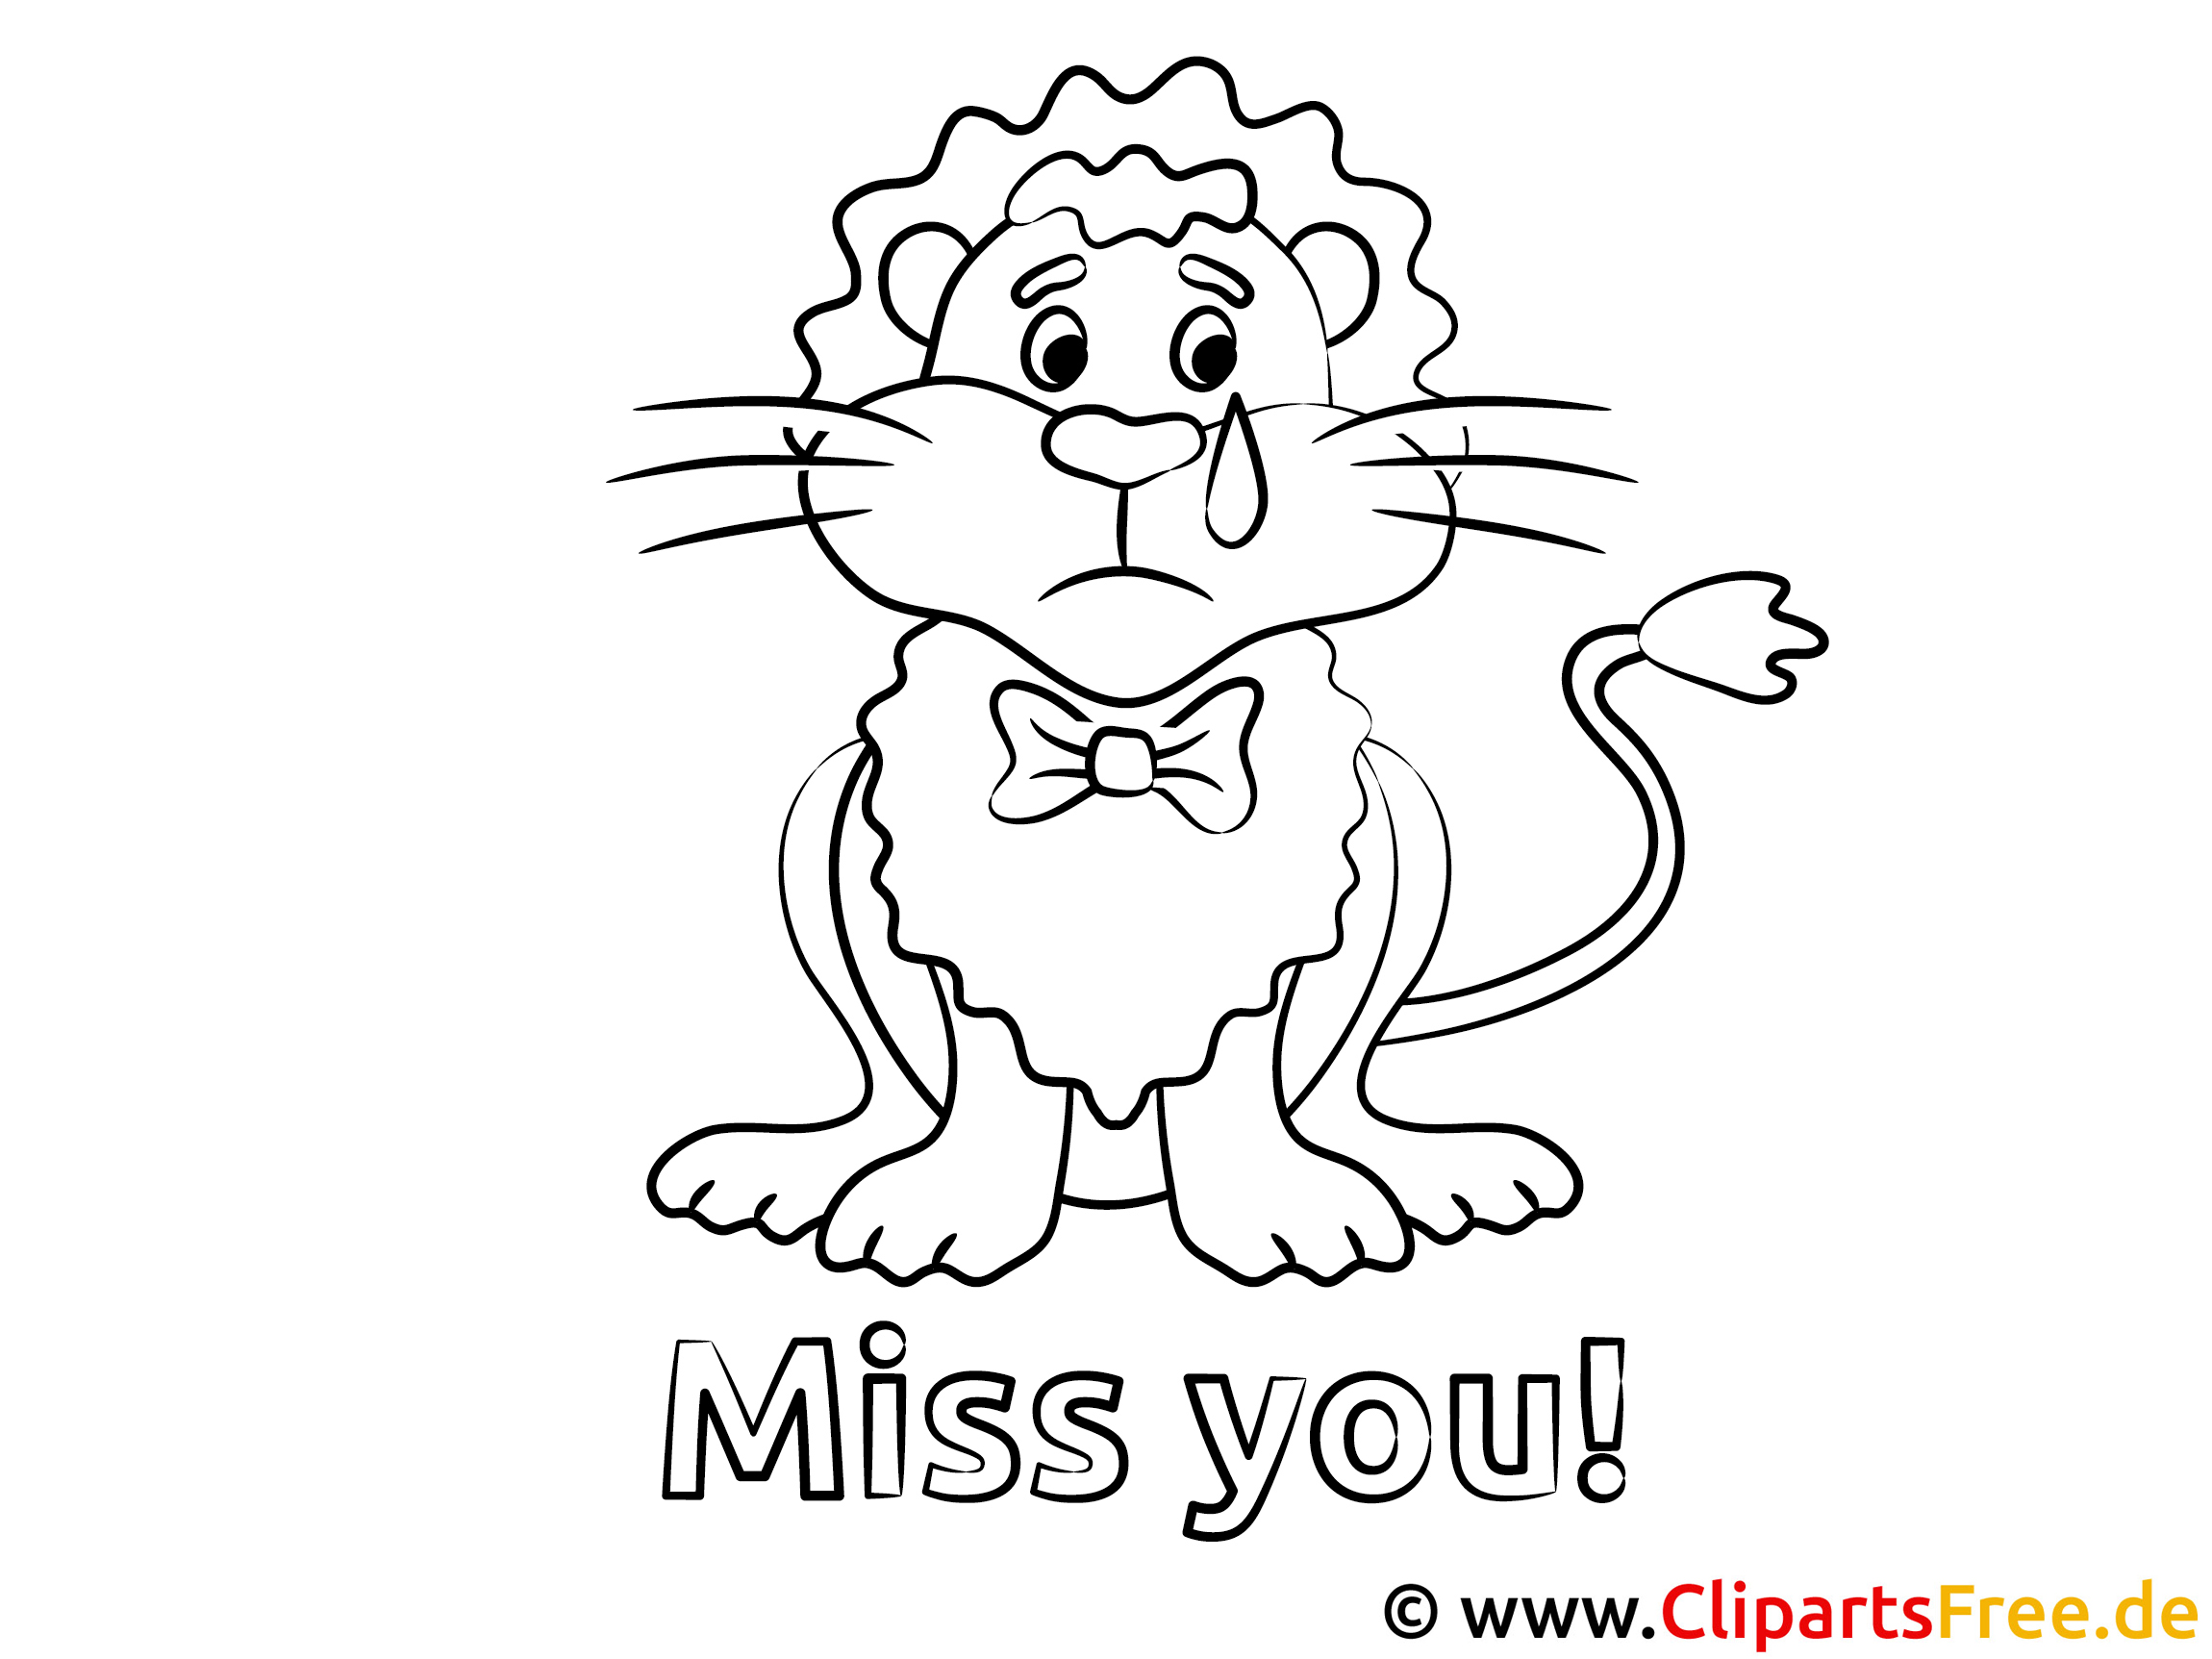 löwe vermisse dich ausmalbild